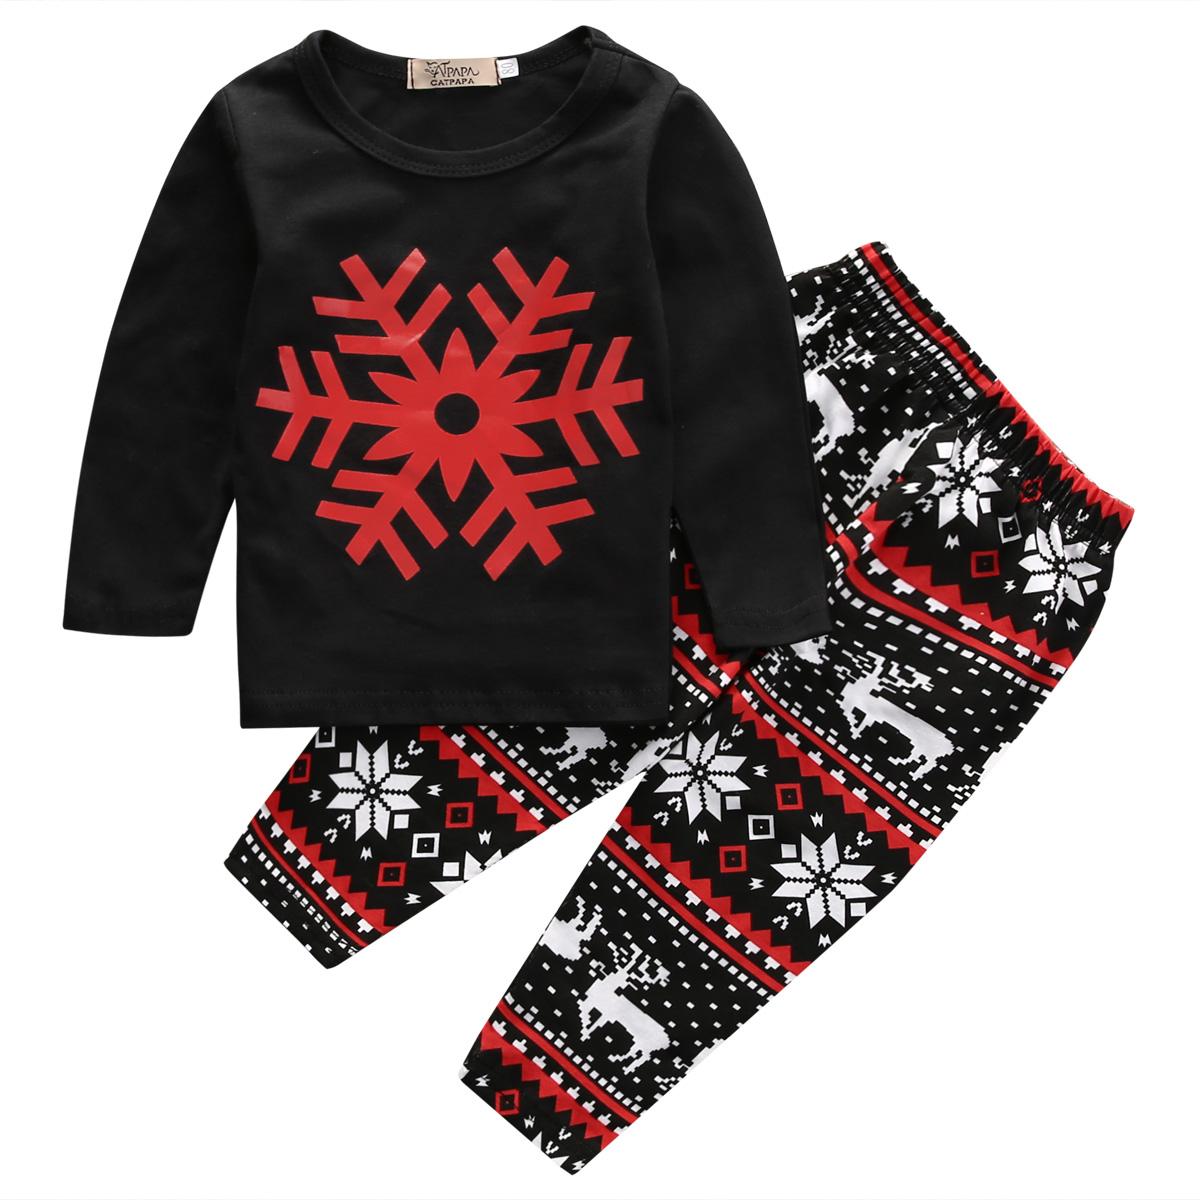 Aliexpress Buy 2pcs Baby Clothing Sets 2016 Autumn